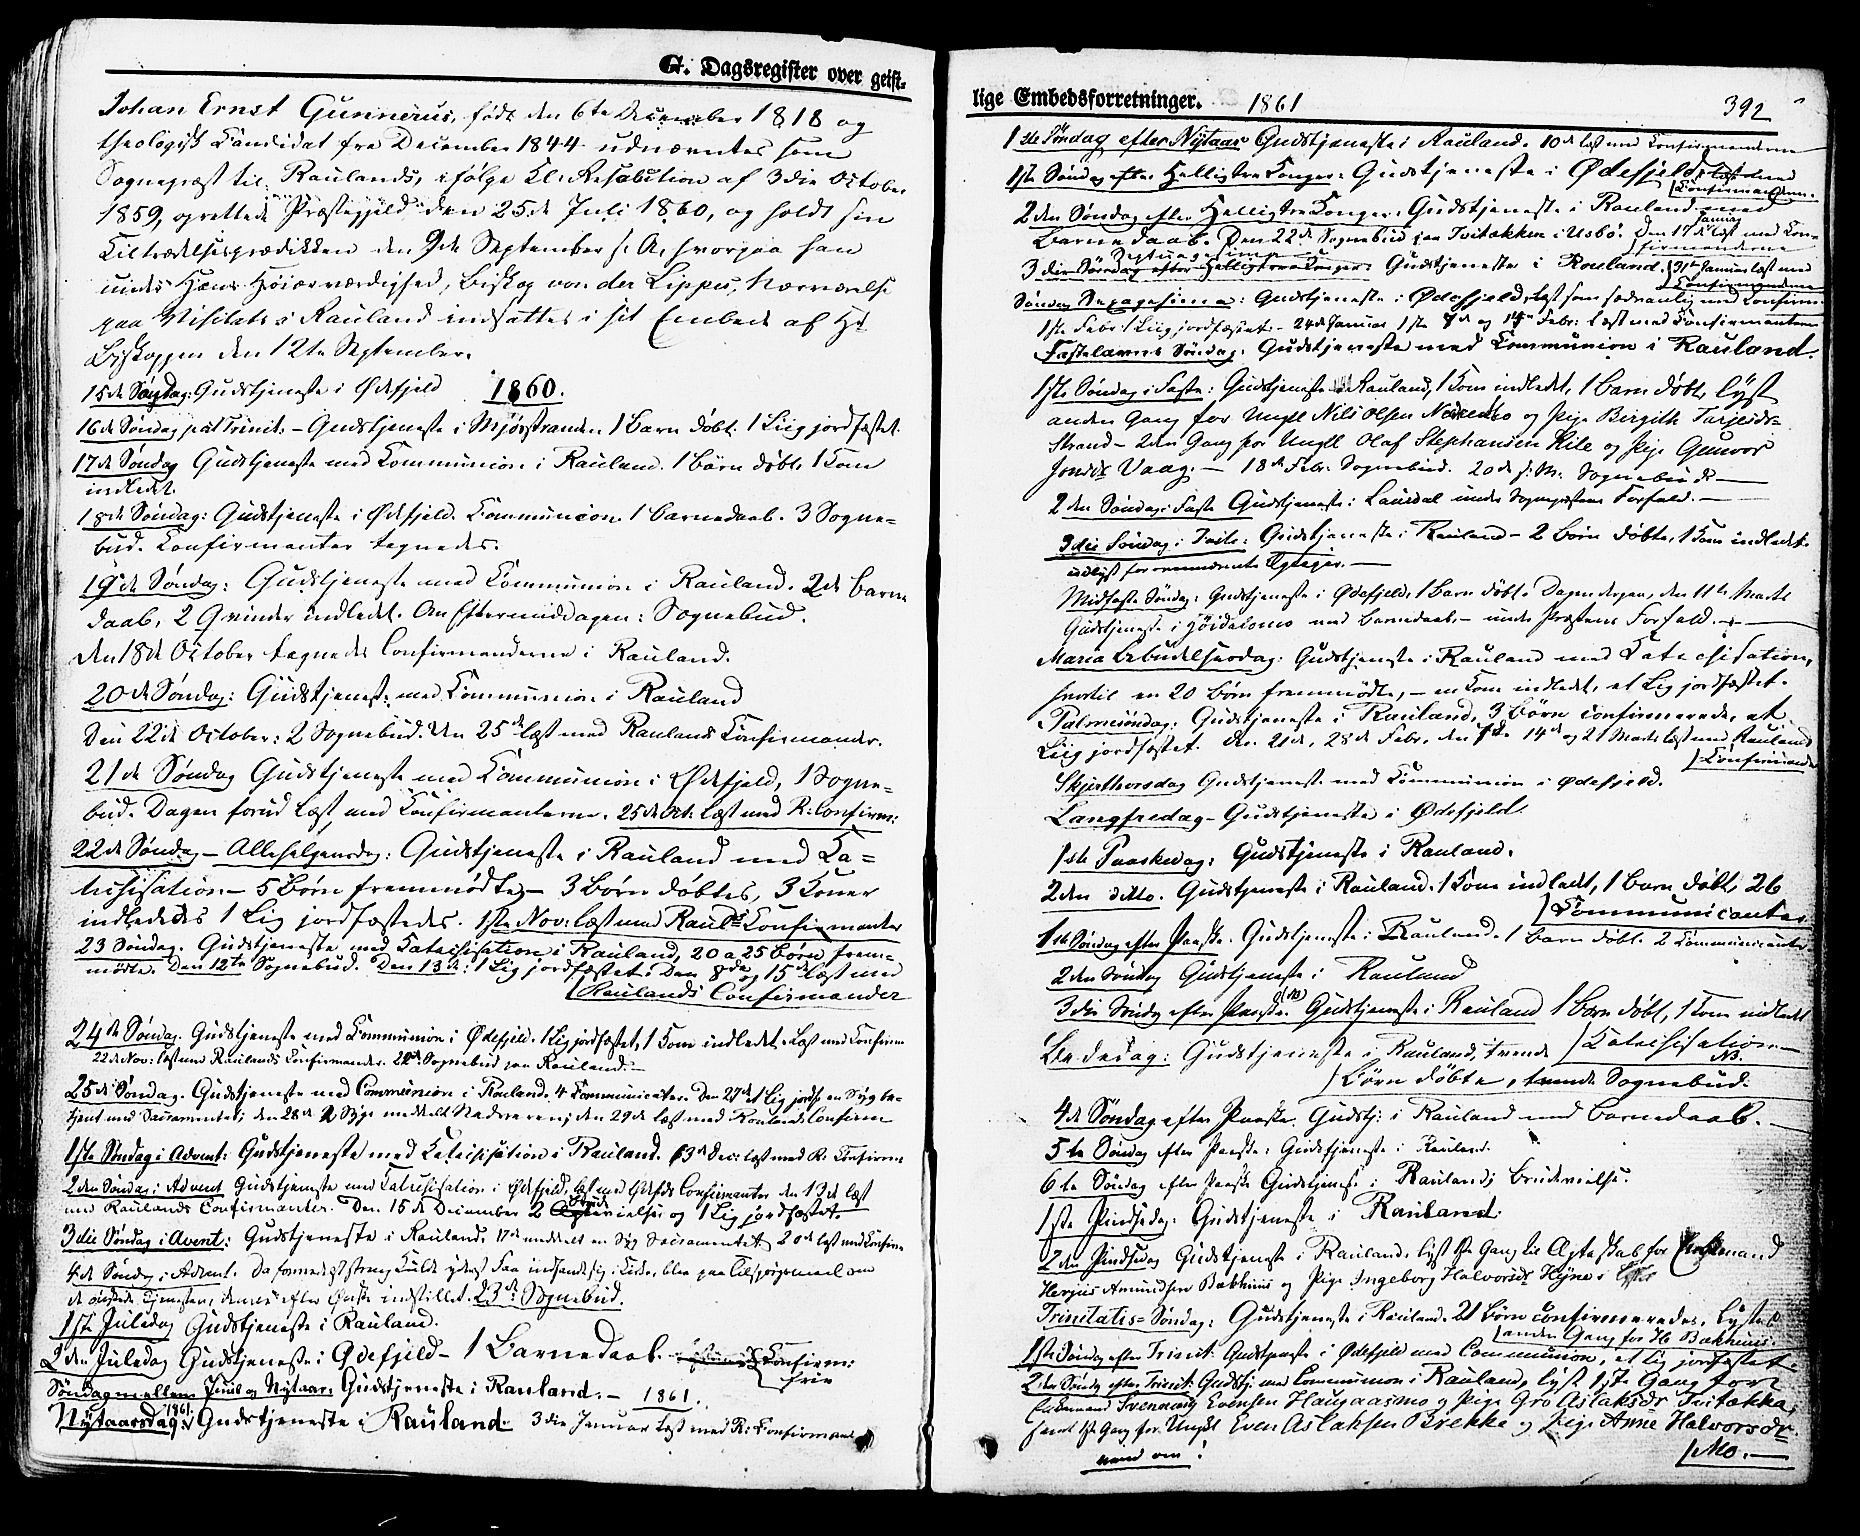 SAKO, Rauland kirkebøker, F/Fa/L0003: Ministerialbok nr. 3, 1859-1886, s. 392